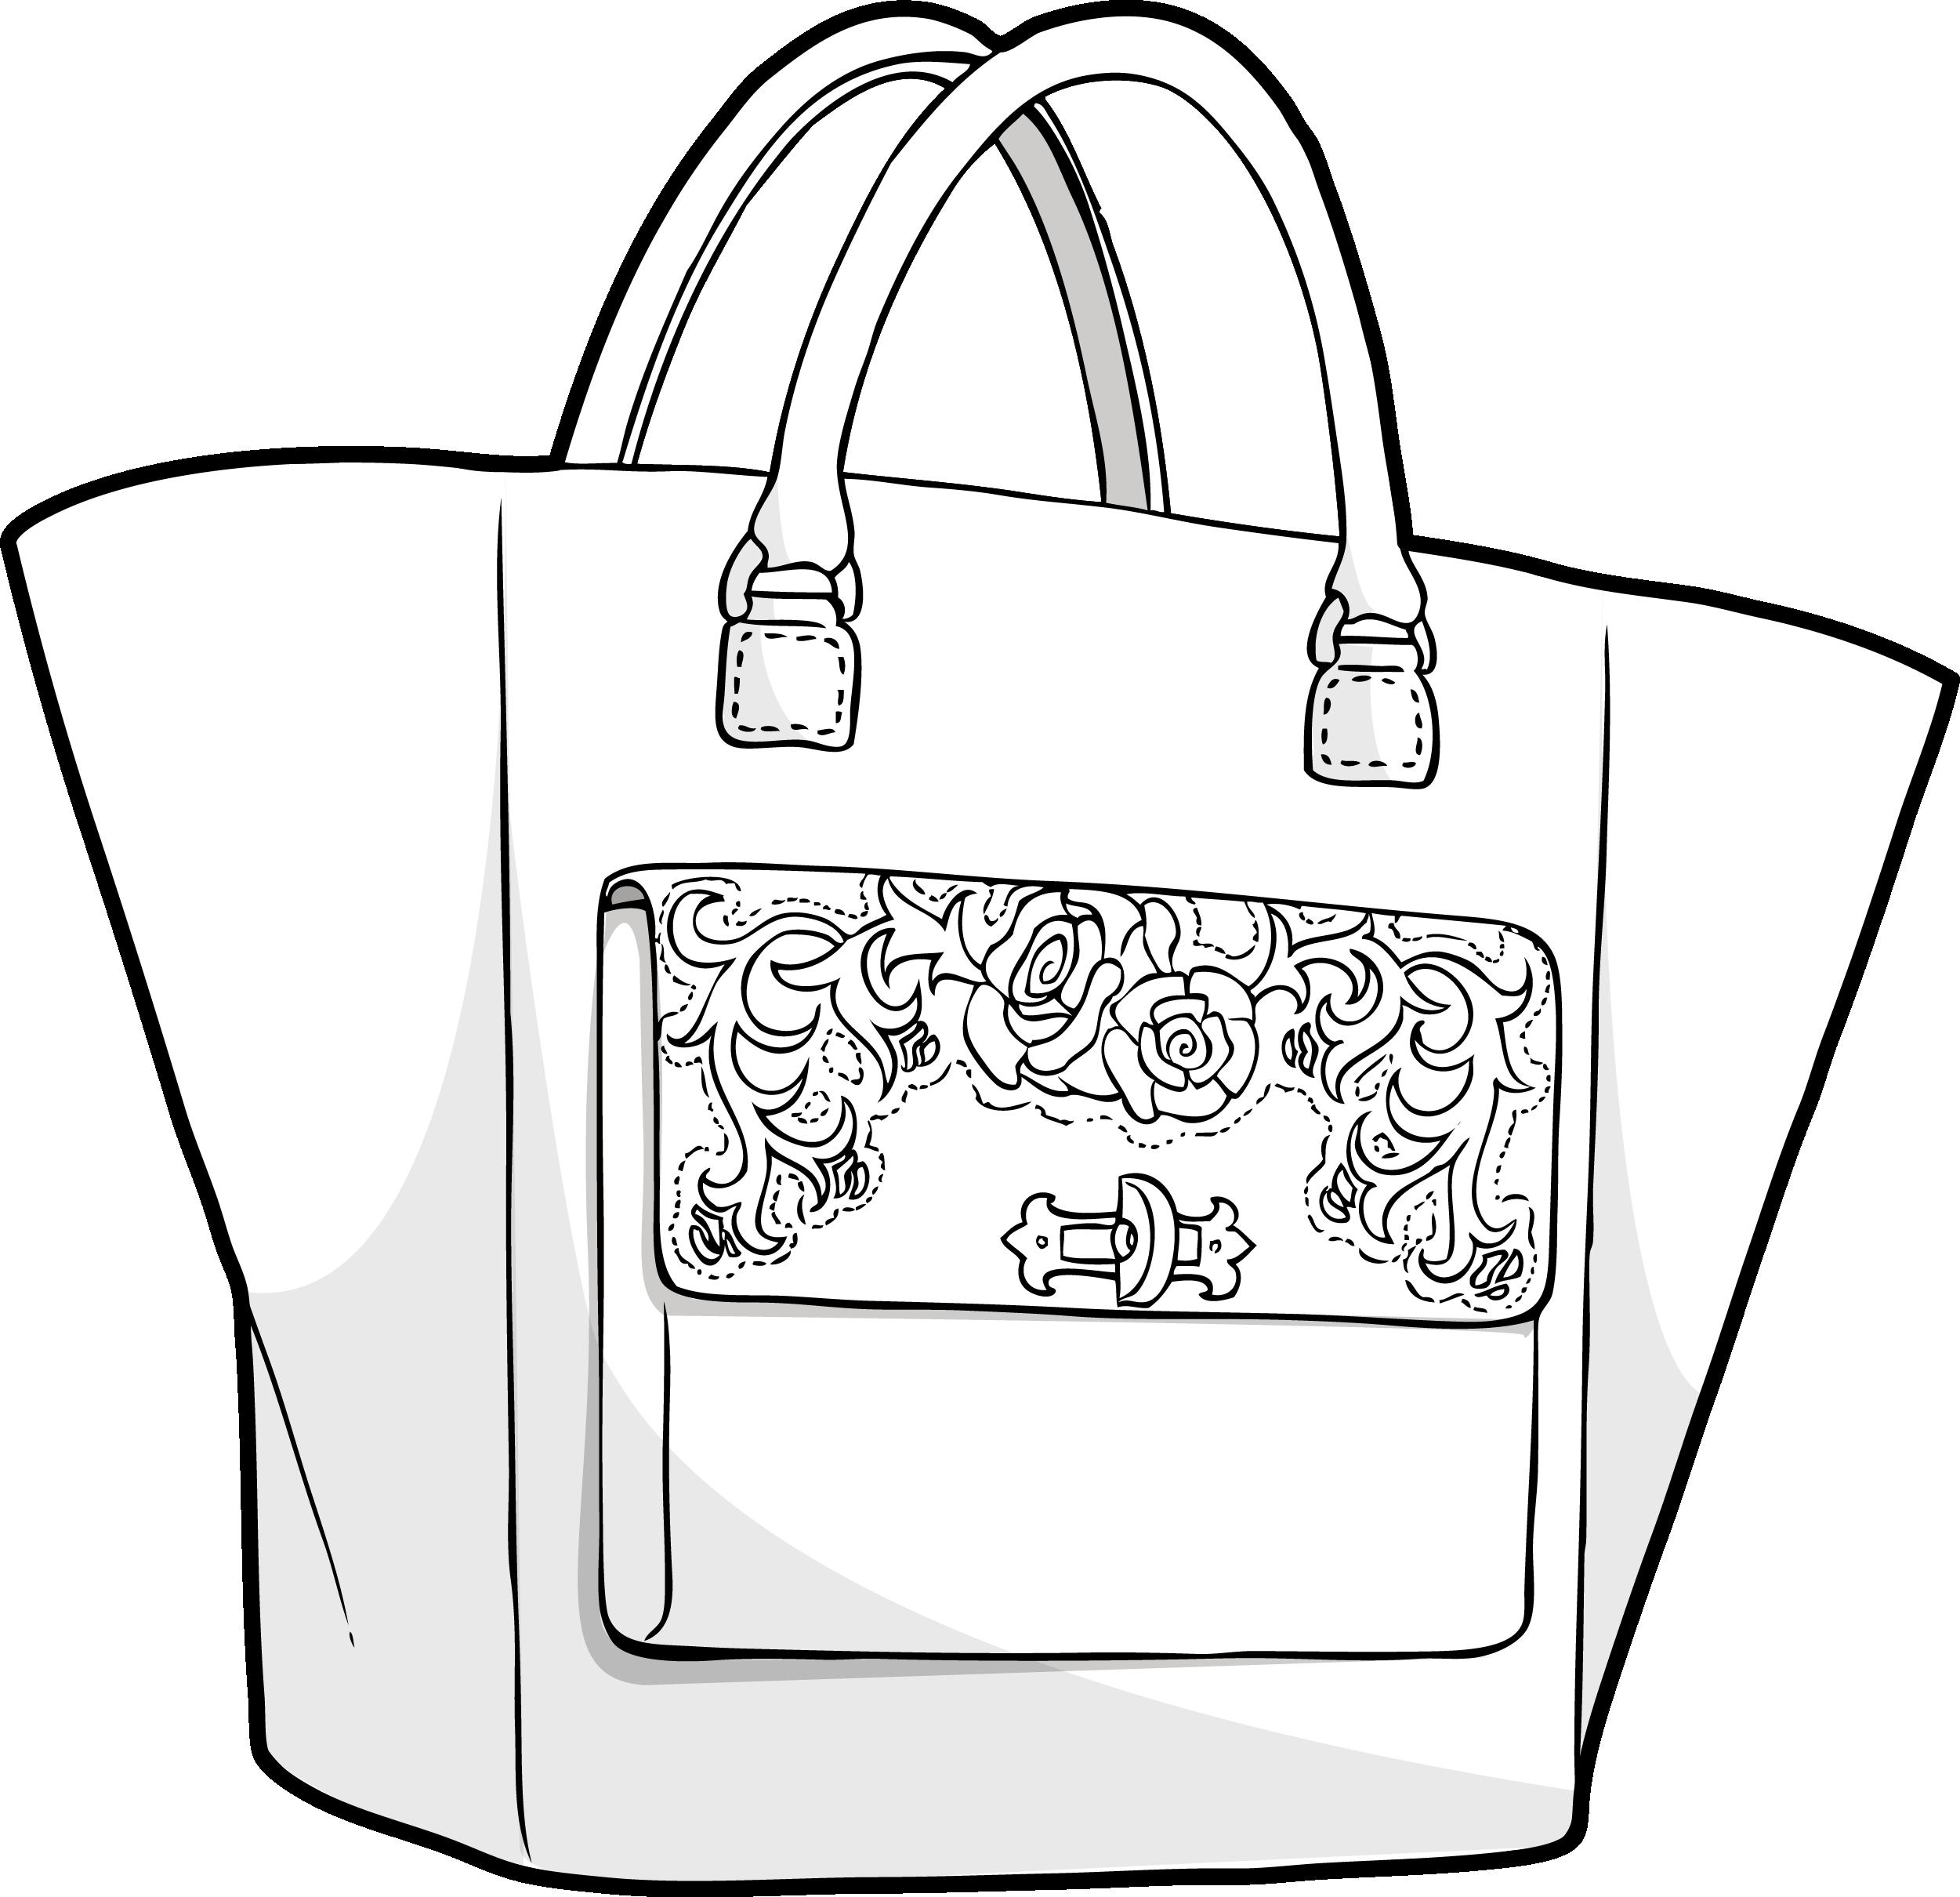 A Nice Bag